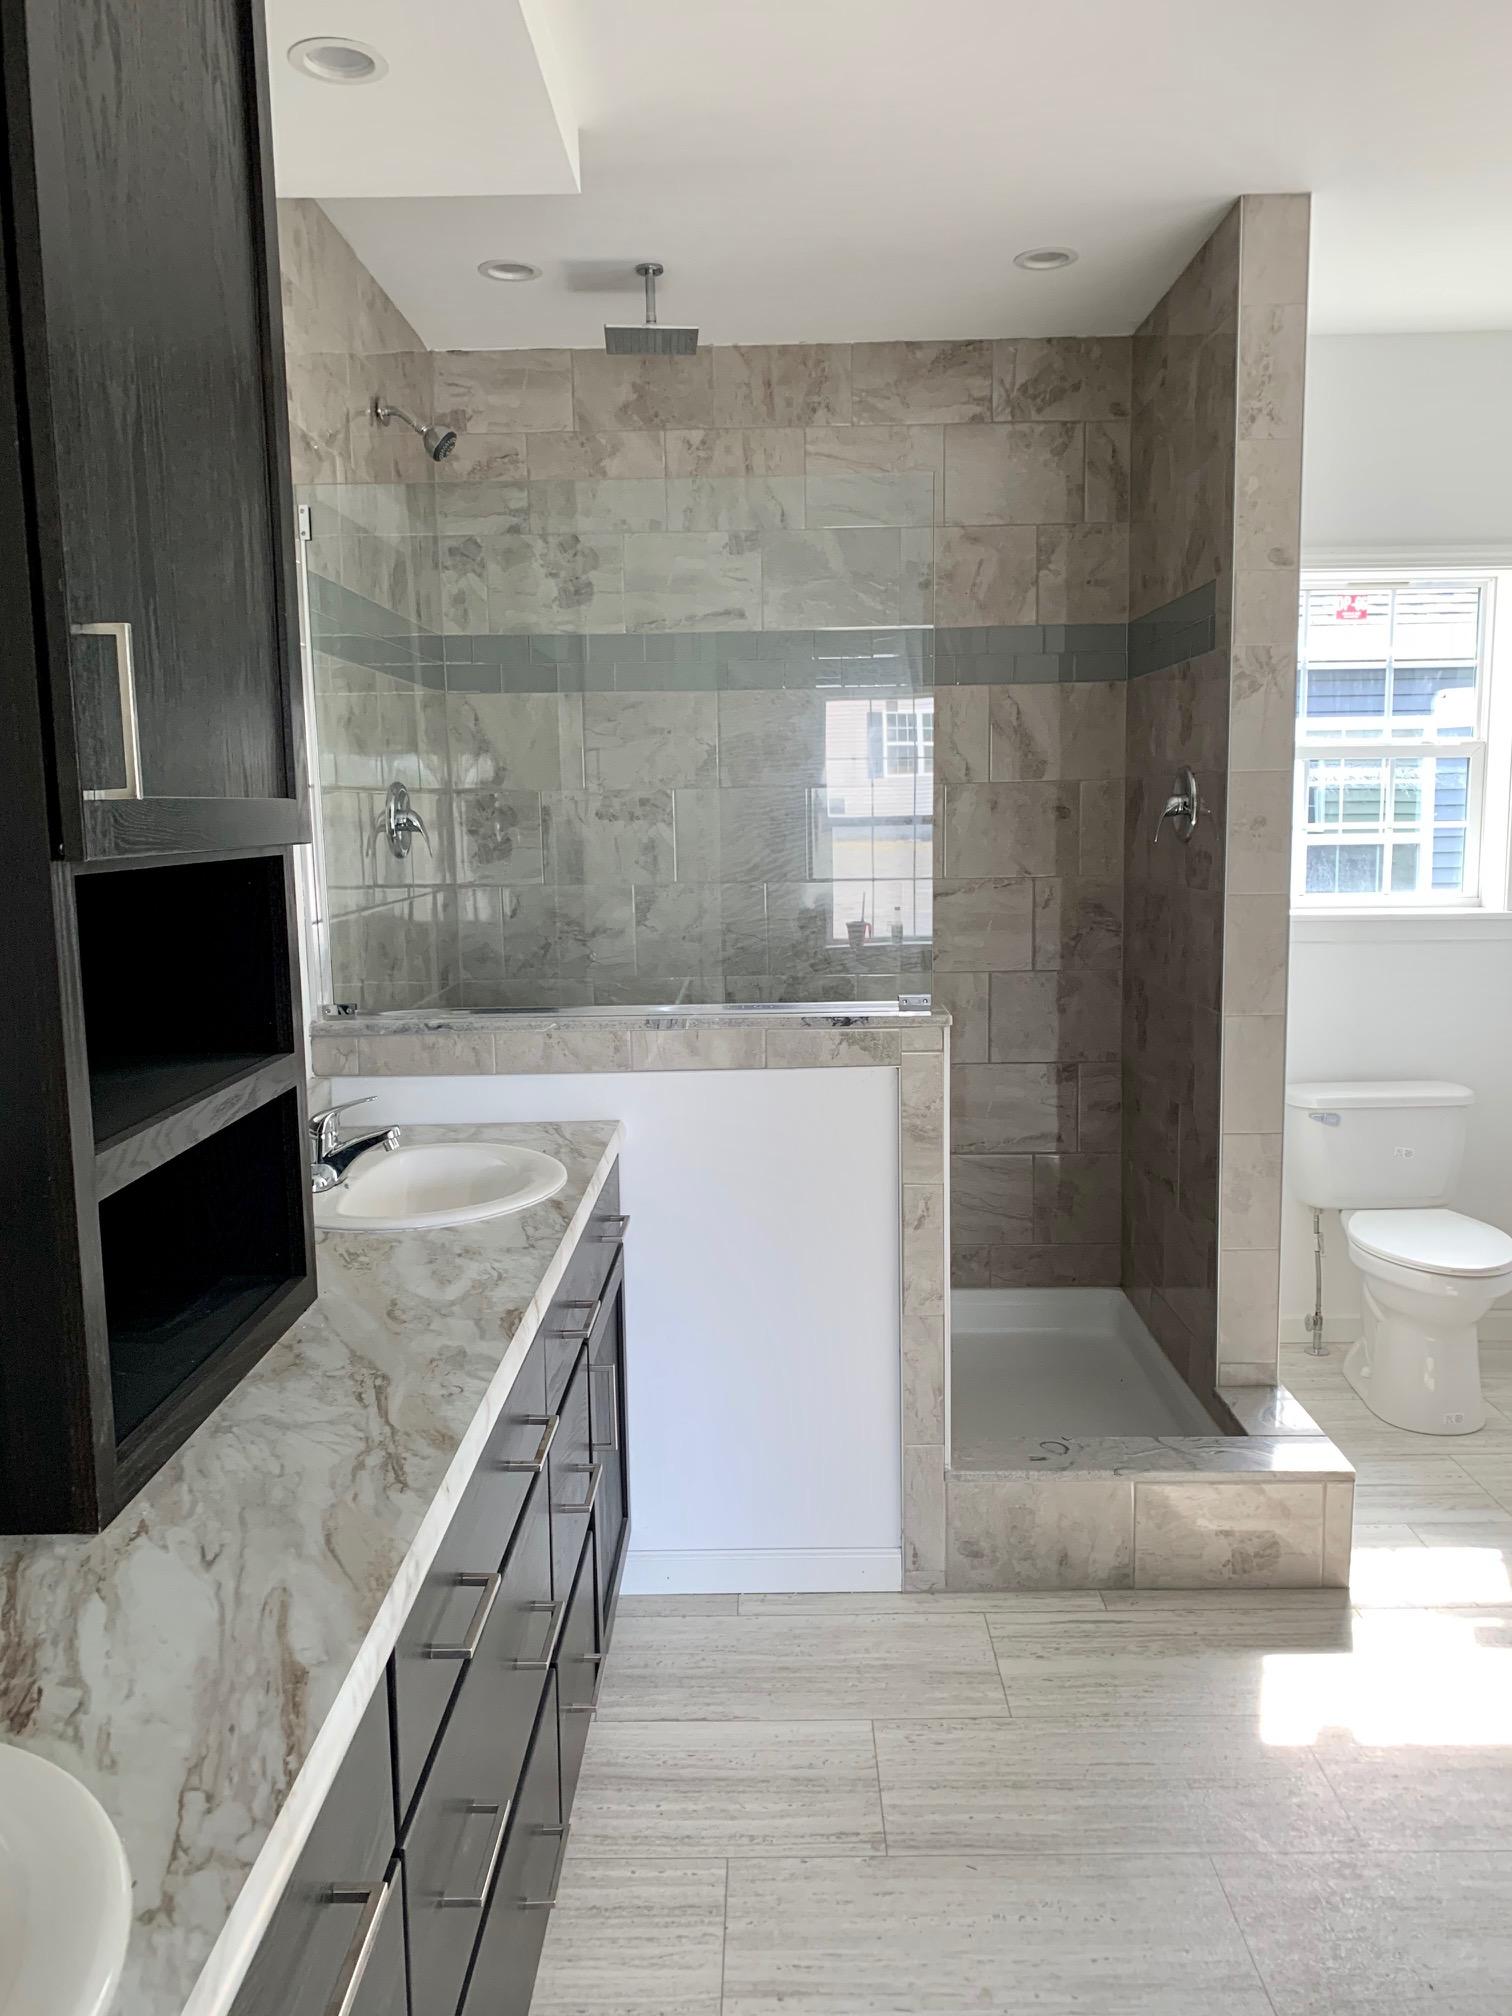 Standard Tile  Shower , Barn Door Tile Shower Option Will Save Some Money